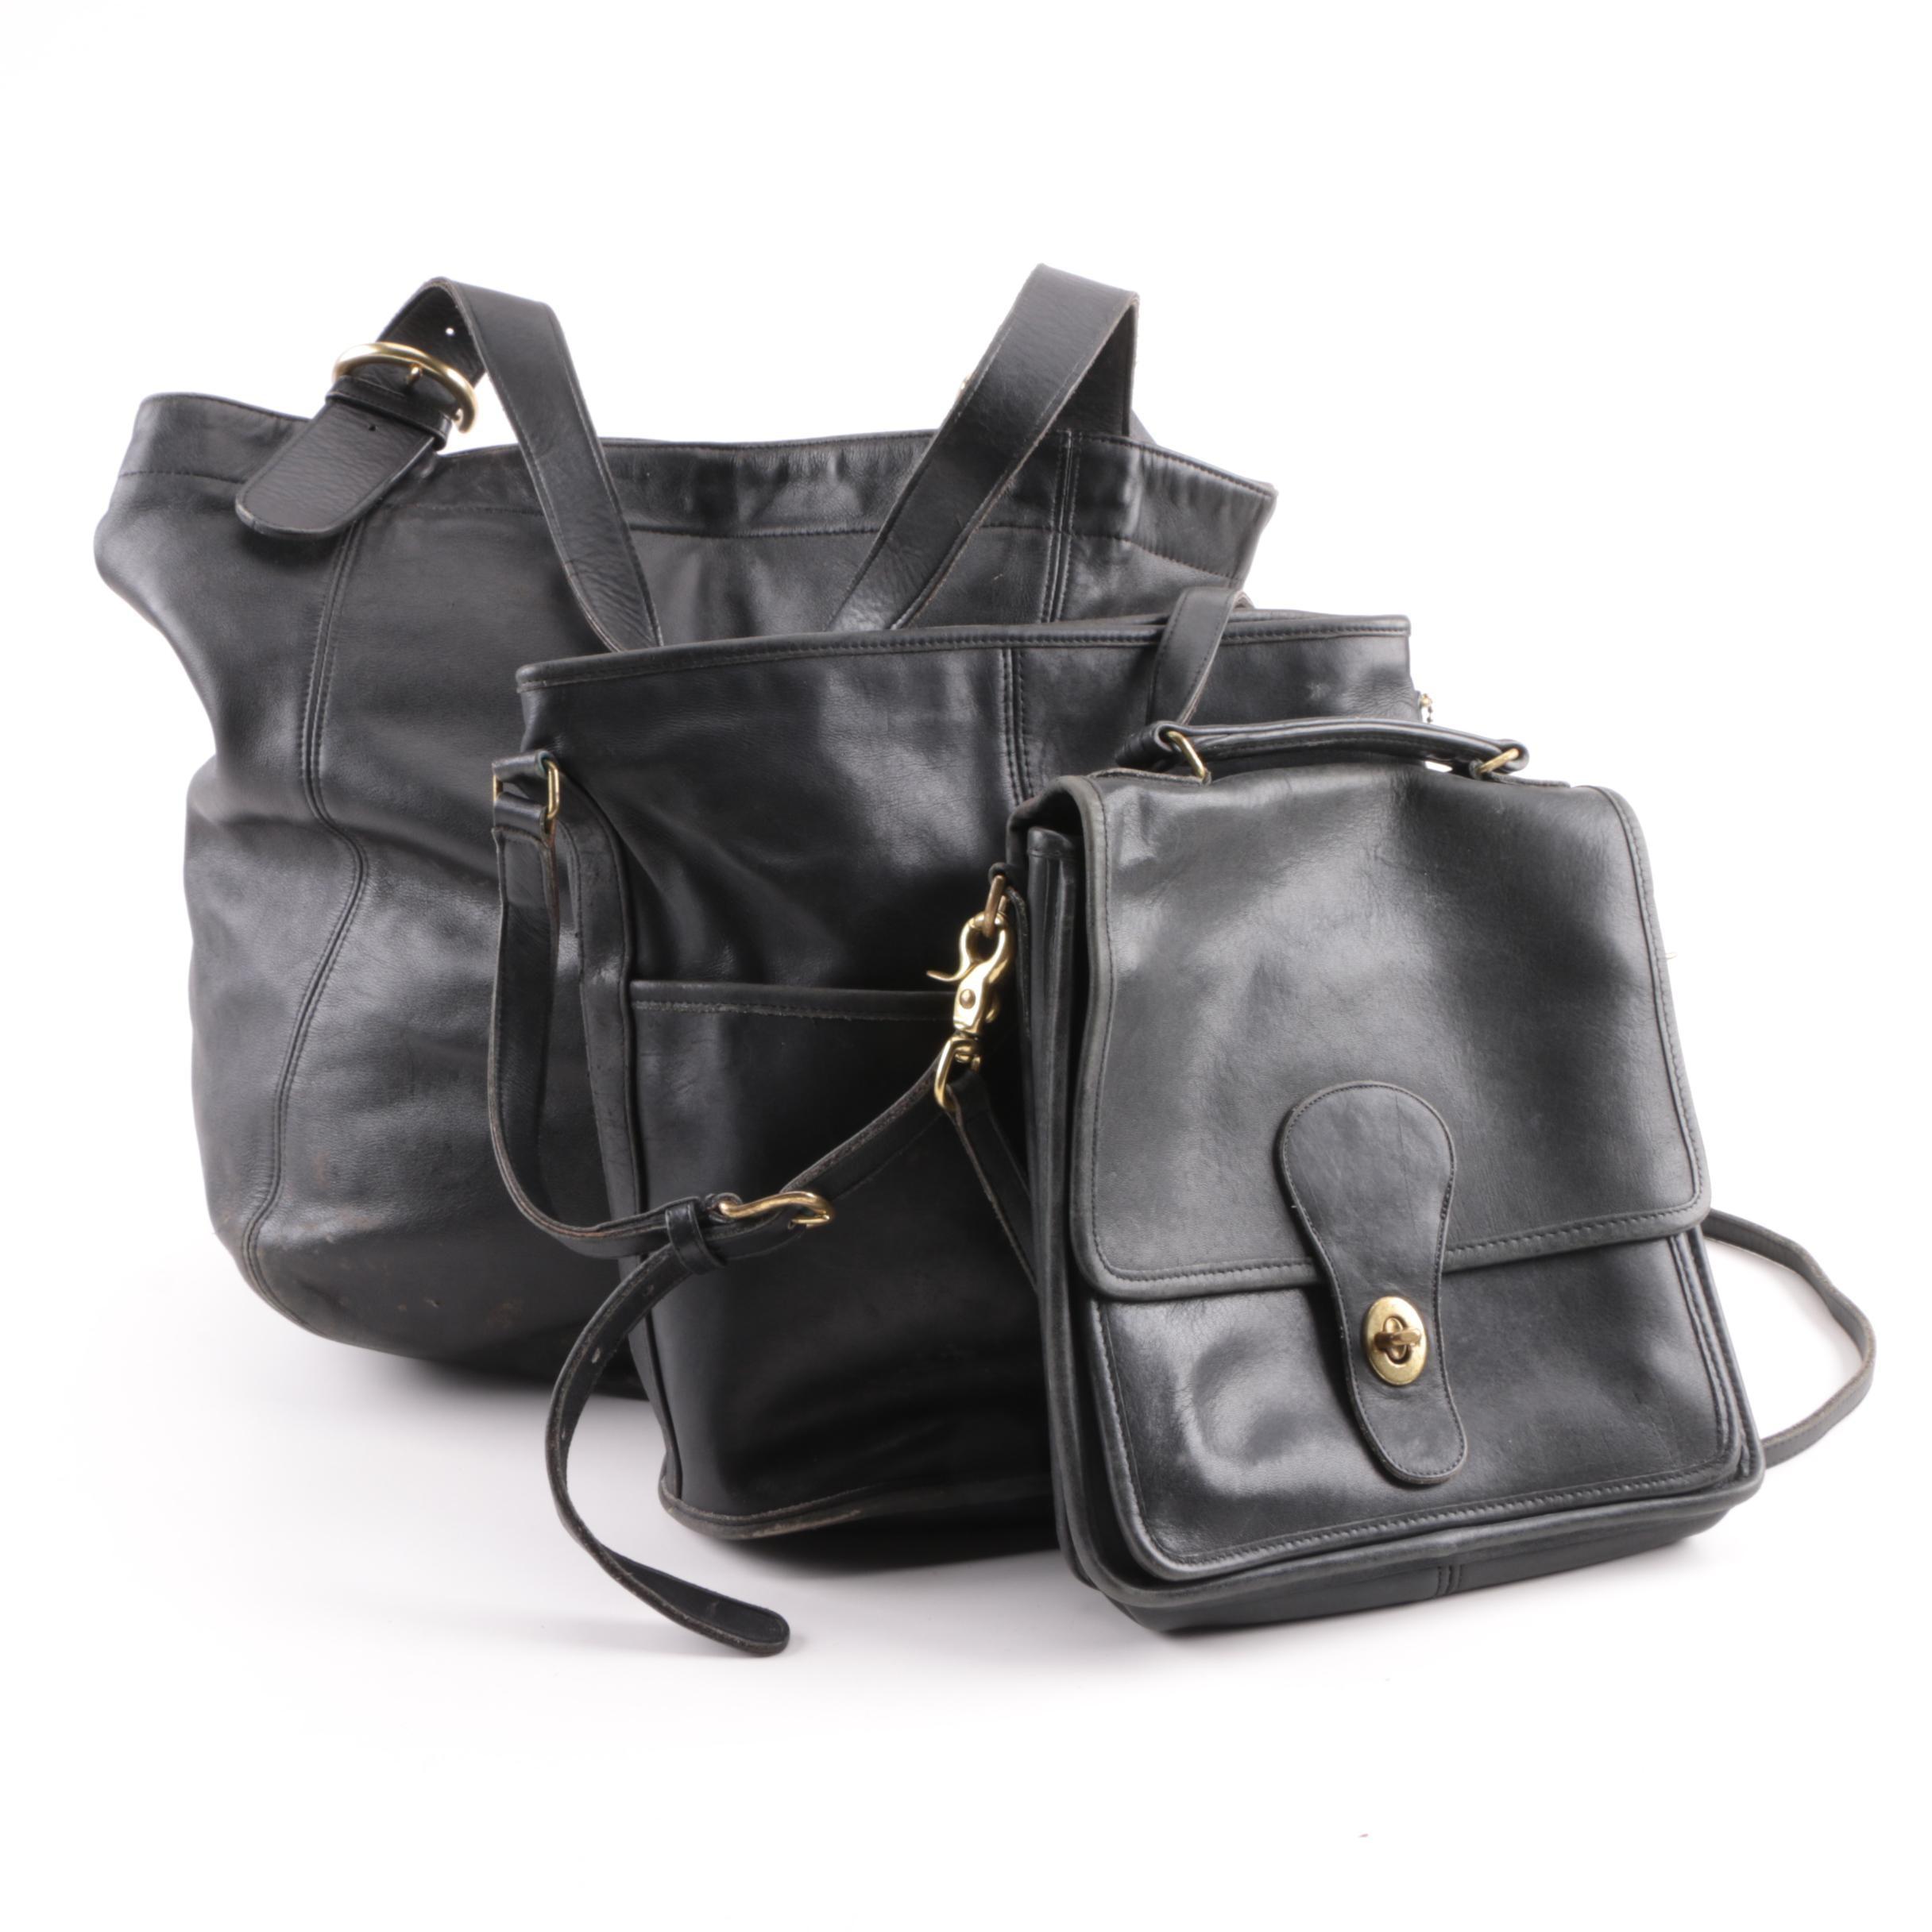 Vintage Coach Black Leather Handbags